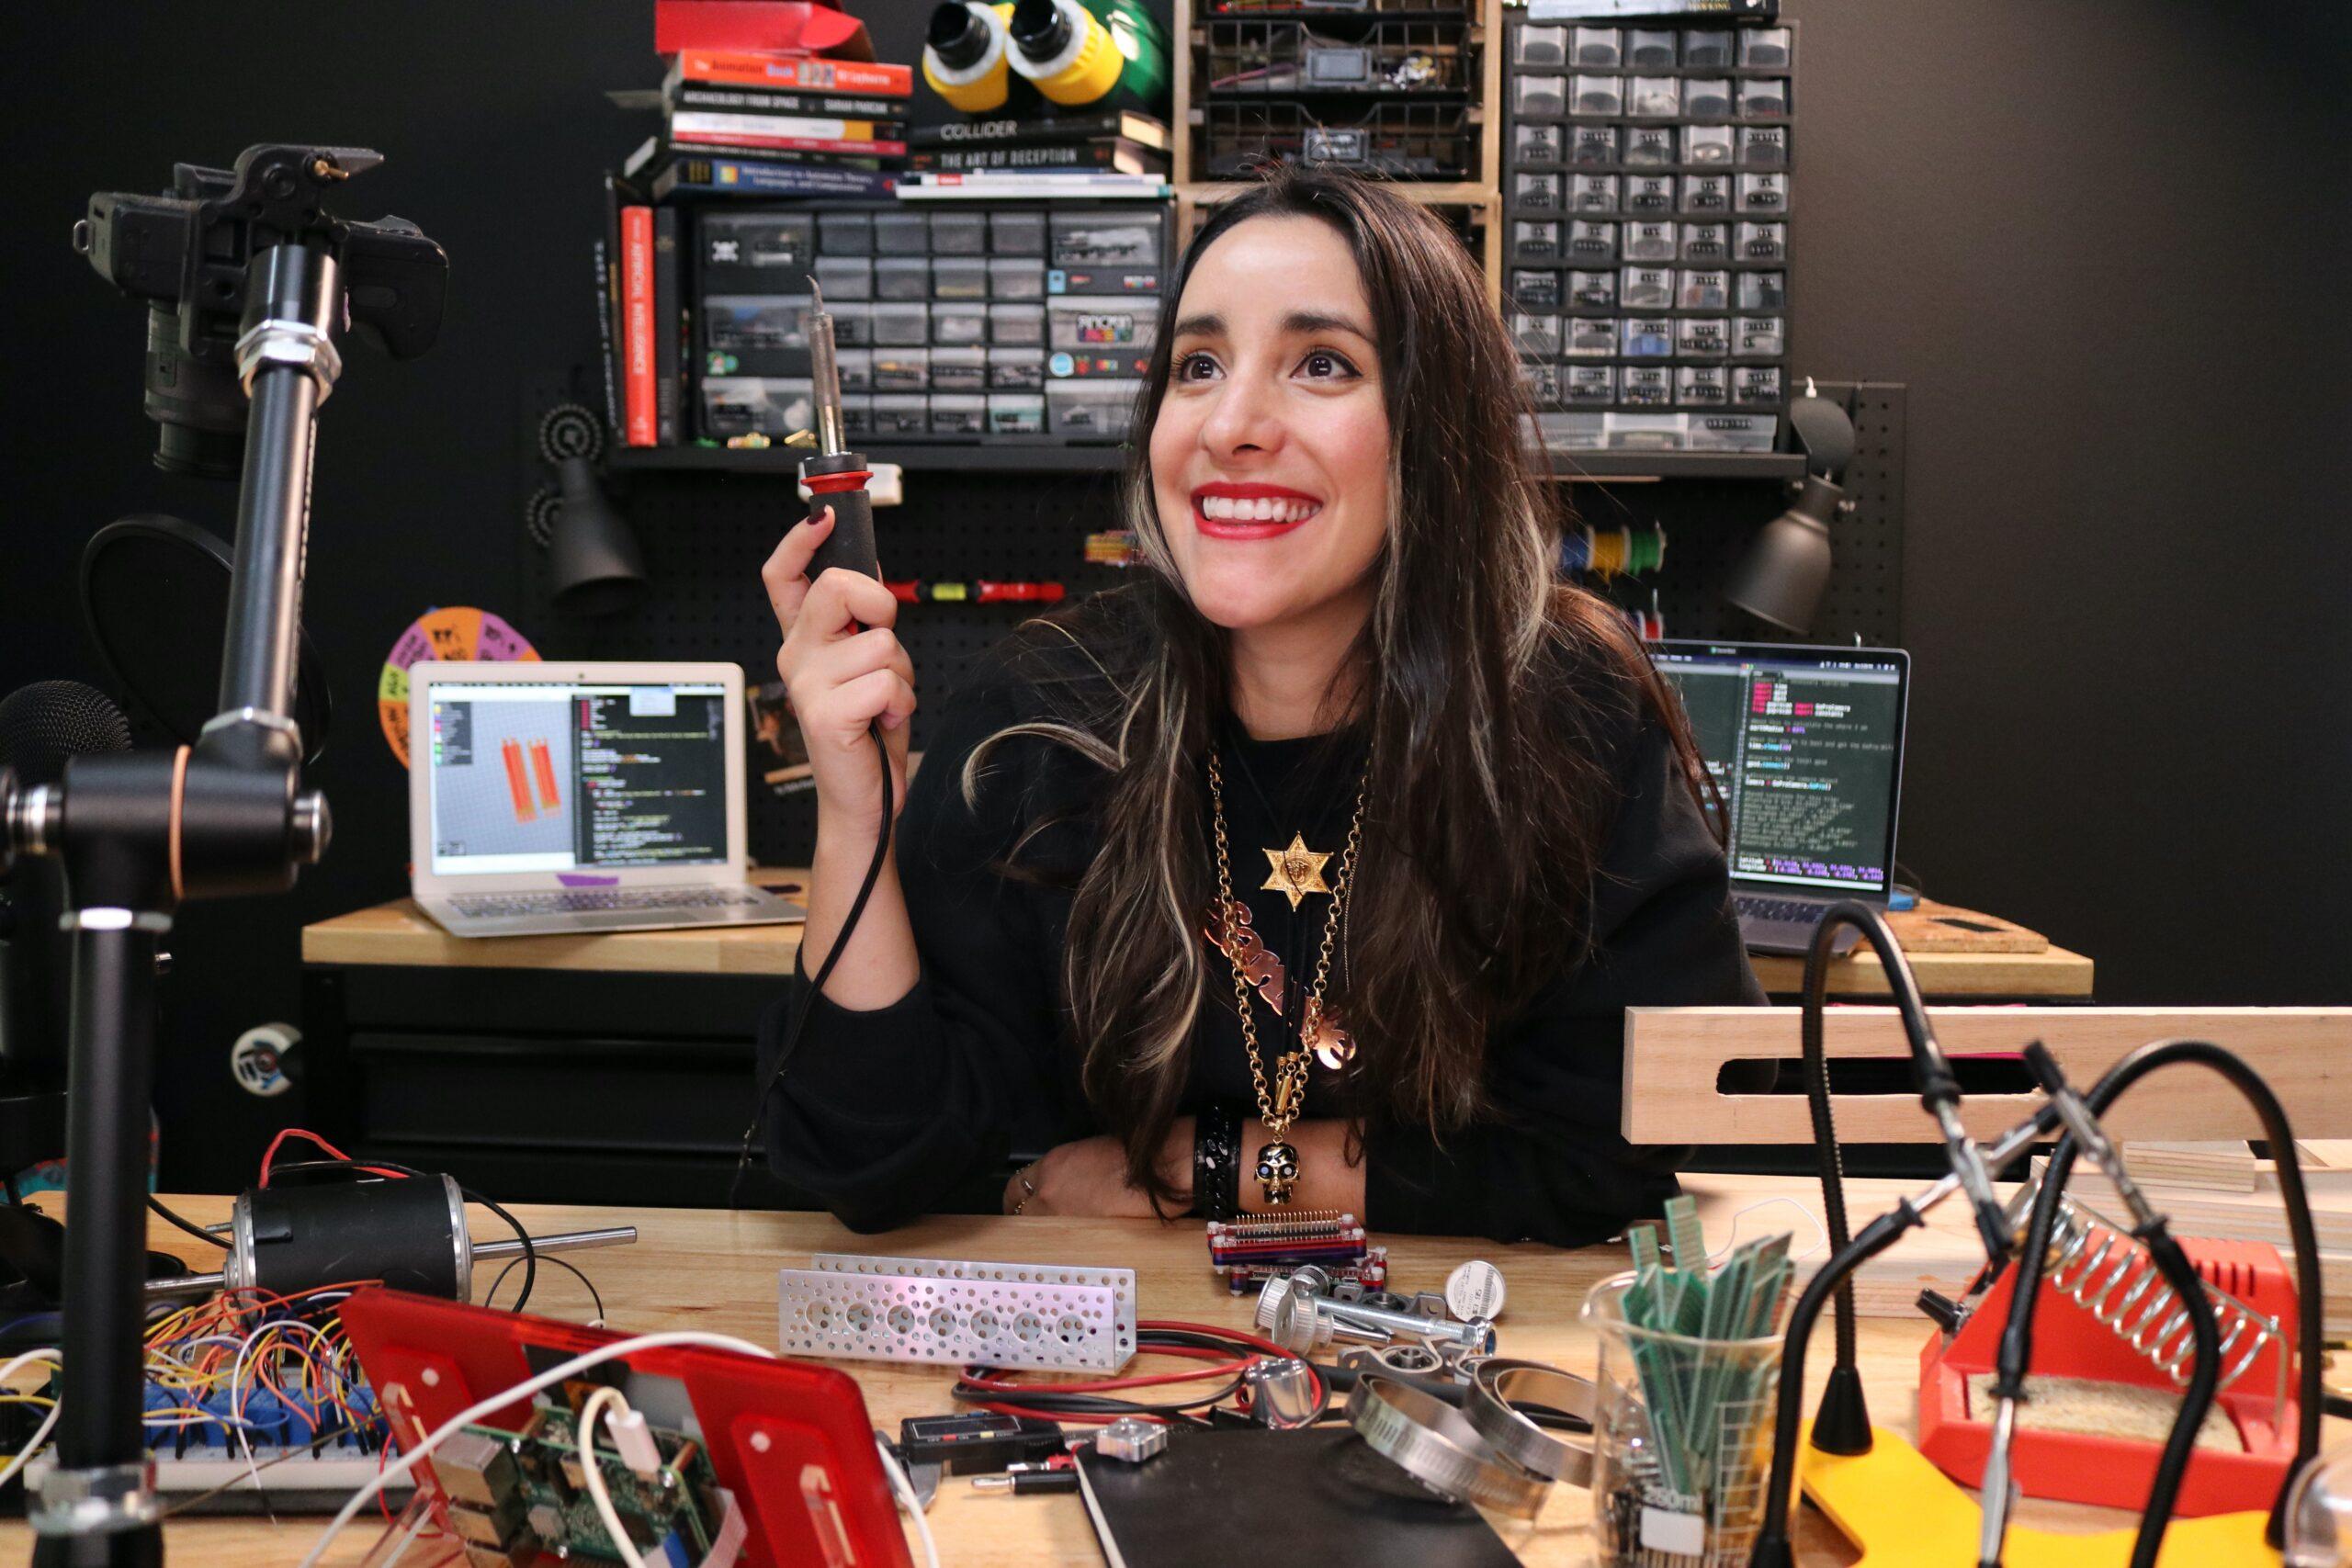 Estefannie with soldering iron at her desk